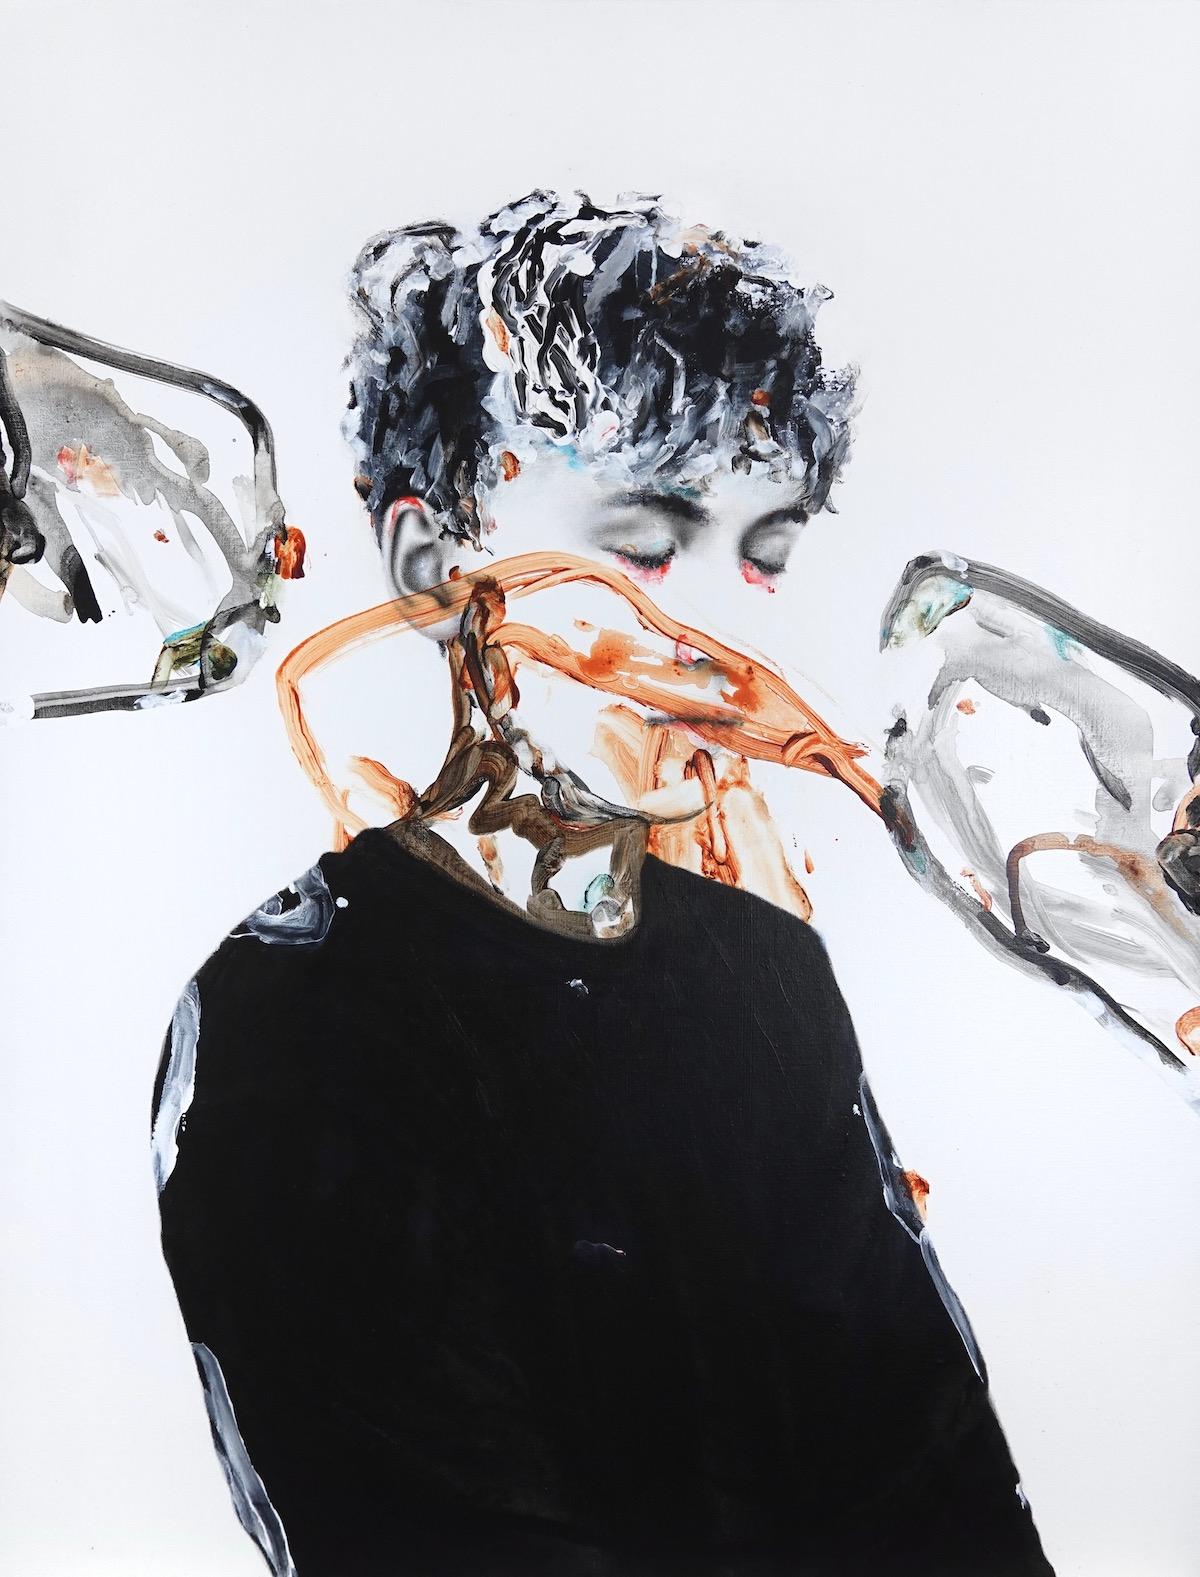 antoine cordet canvas toile peinture painting portrait art artist artiste peintre acrylic oil laudanum